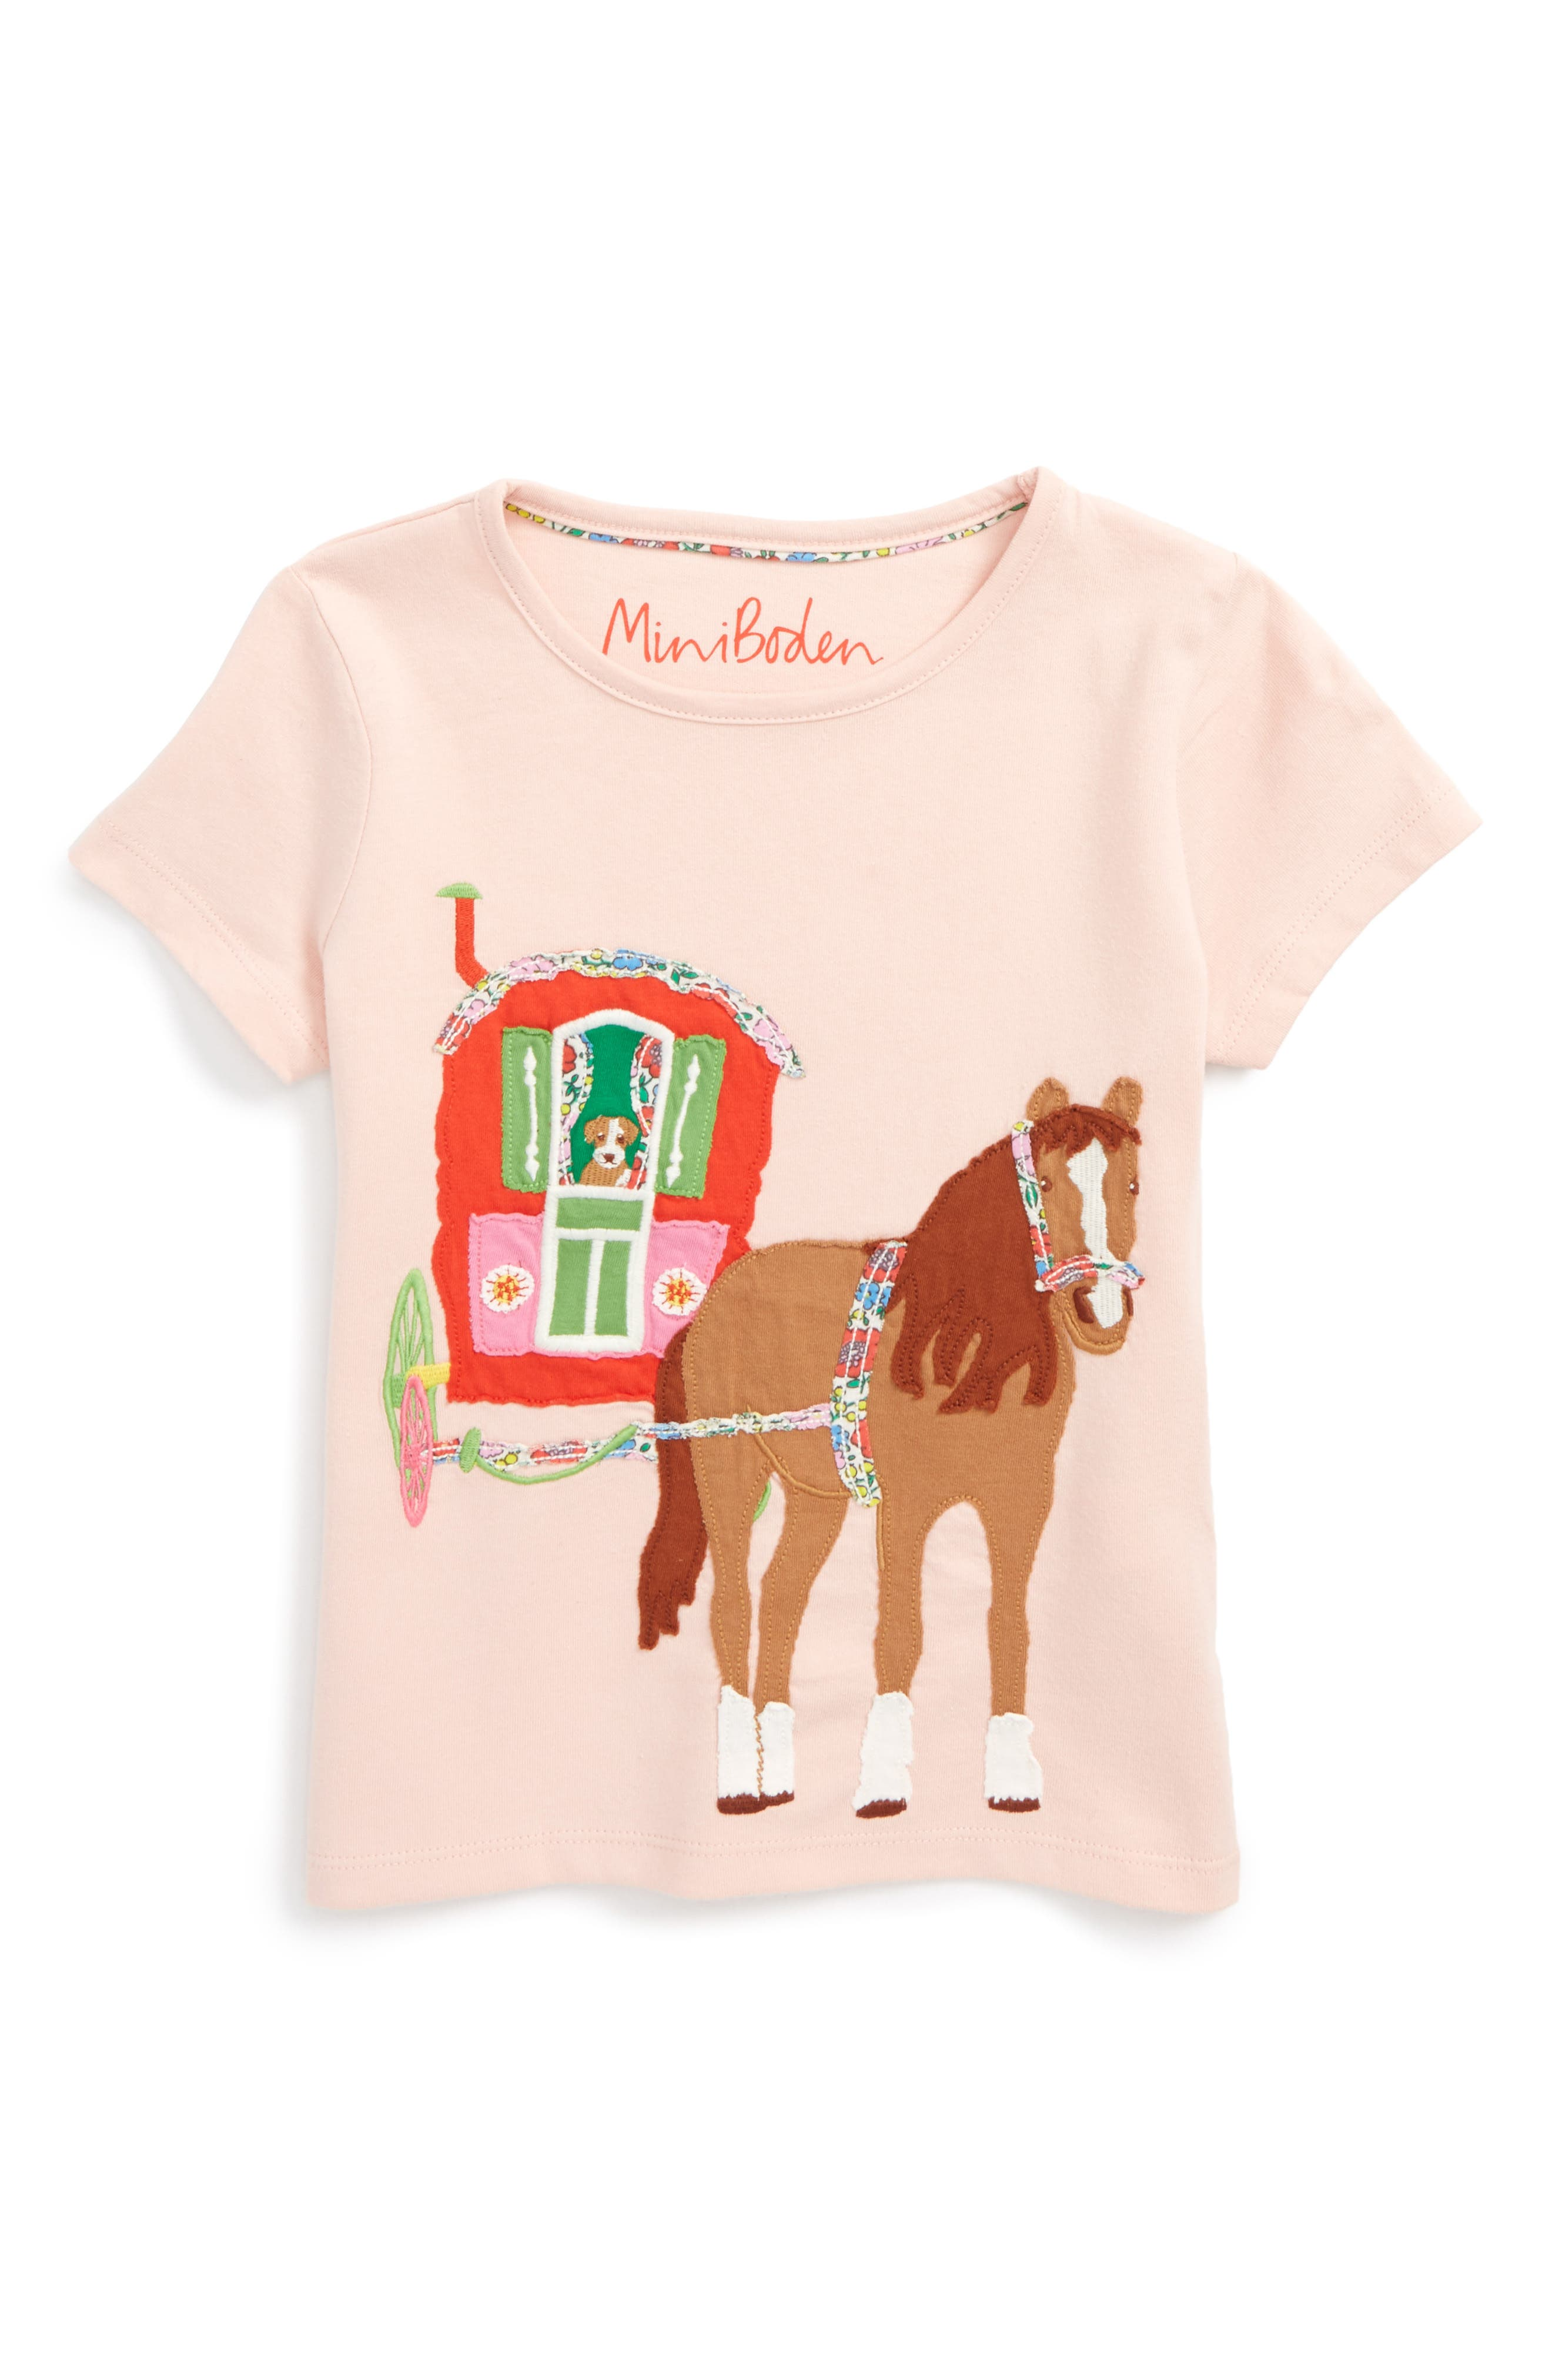 Alternate Image 1 Selected - Mini Boden Patchwork Appliqué Tee (Toddler Girls, Little Girls & Big Girls)